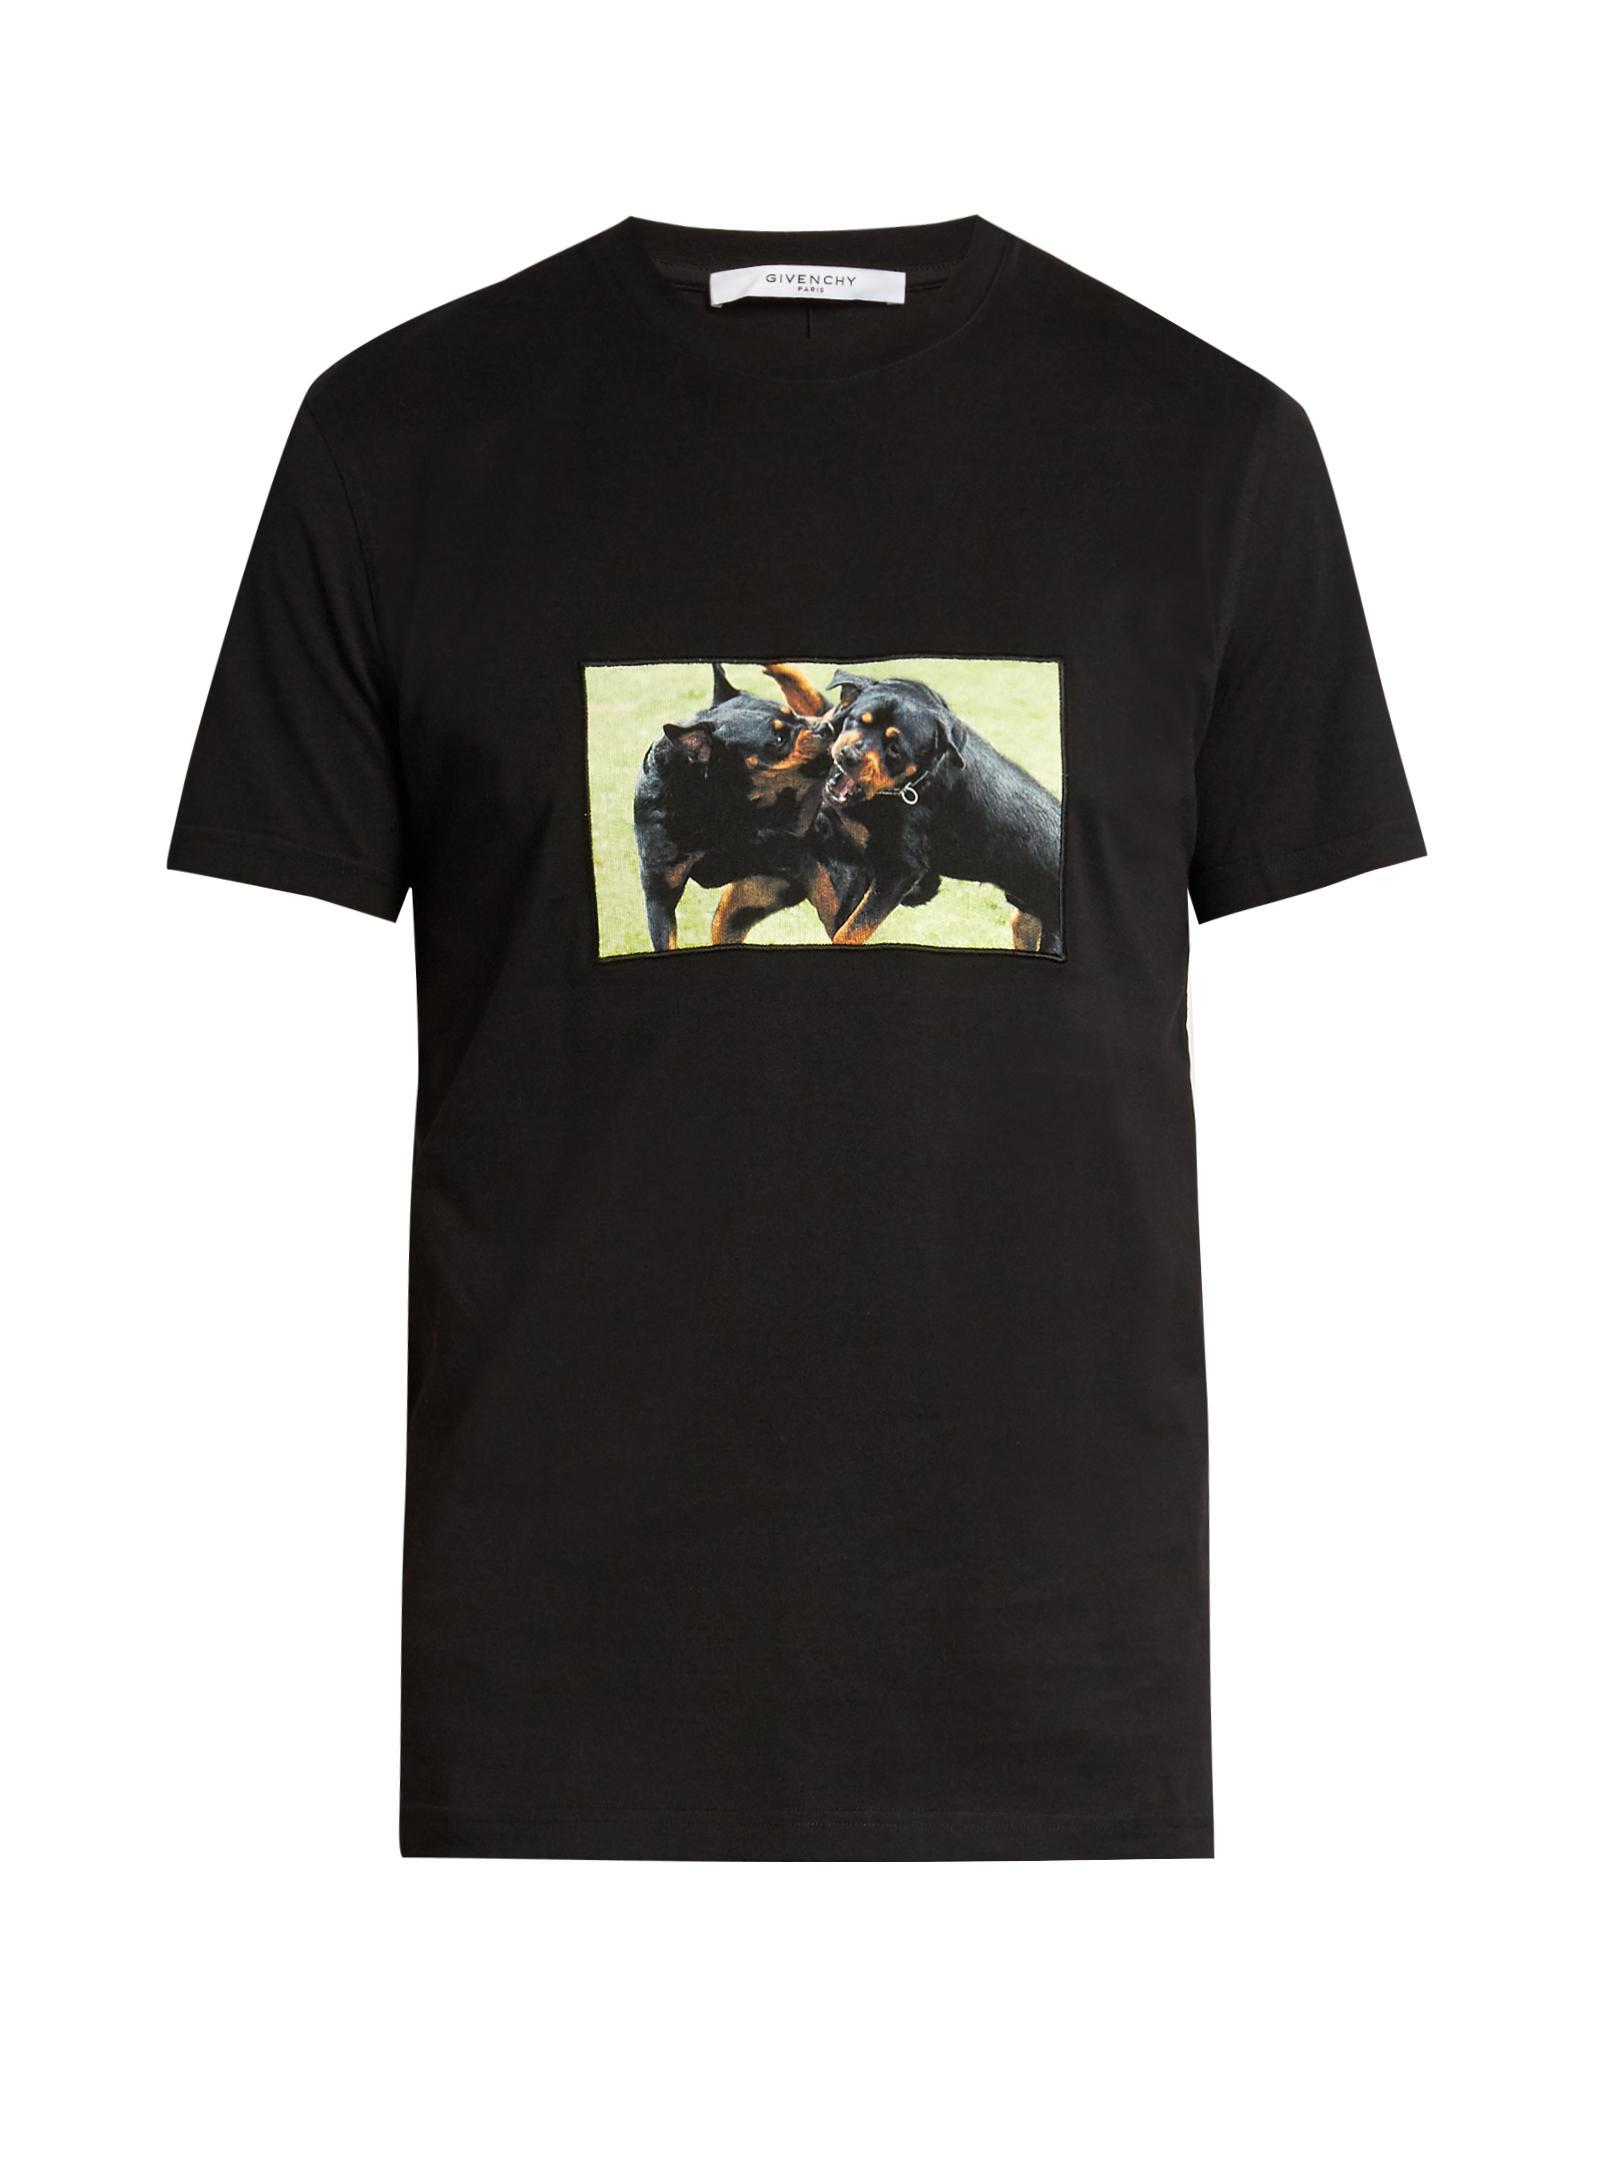 8eba8e11 Givenchy Rottweiler T Shirt Farfetch | The Art of Mike Mignola